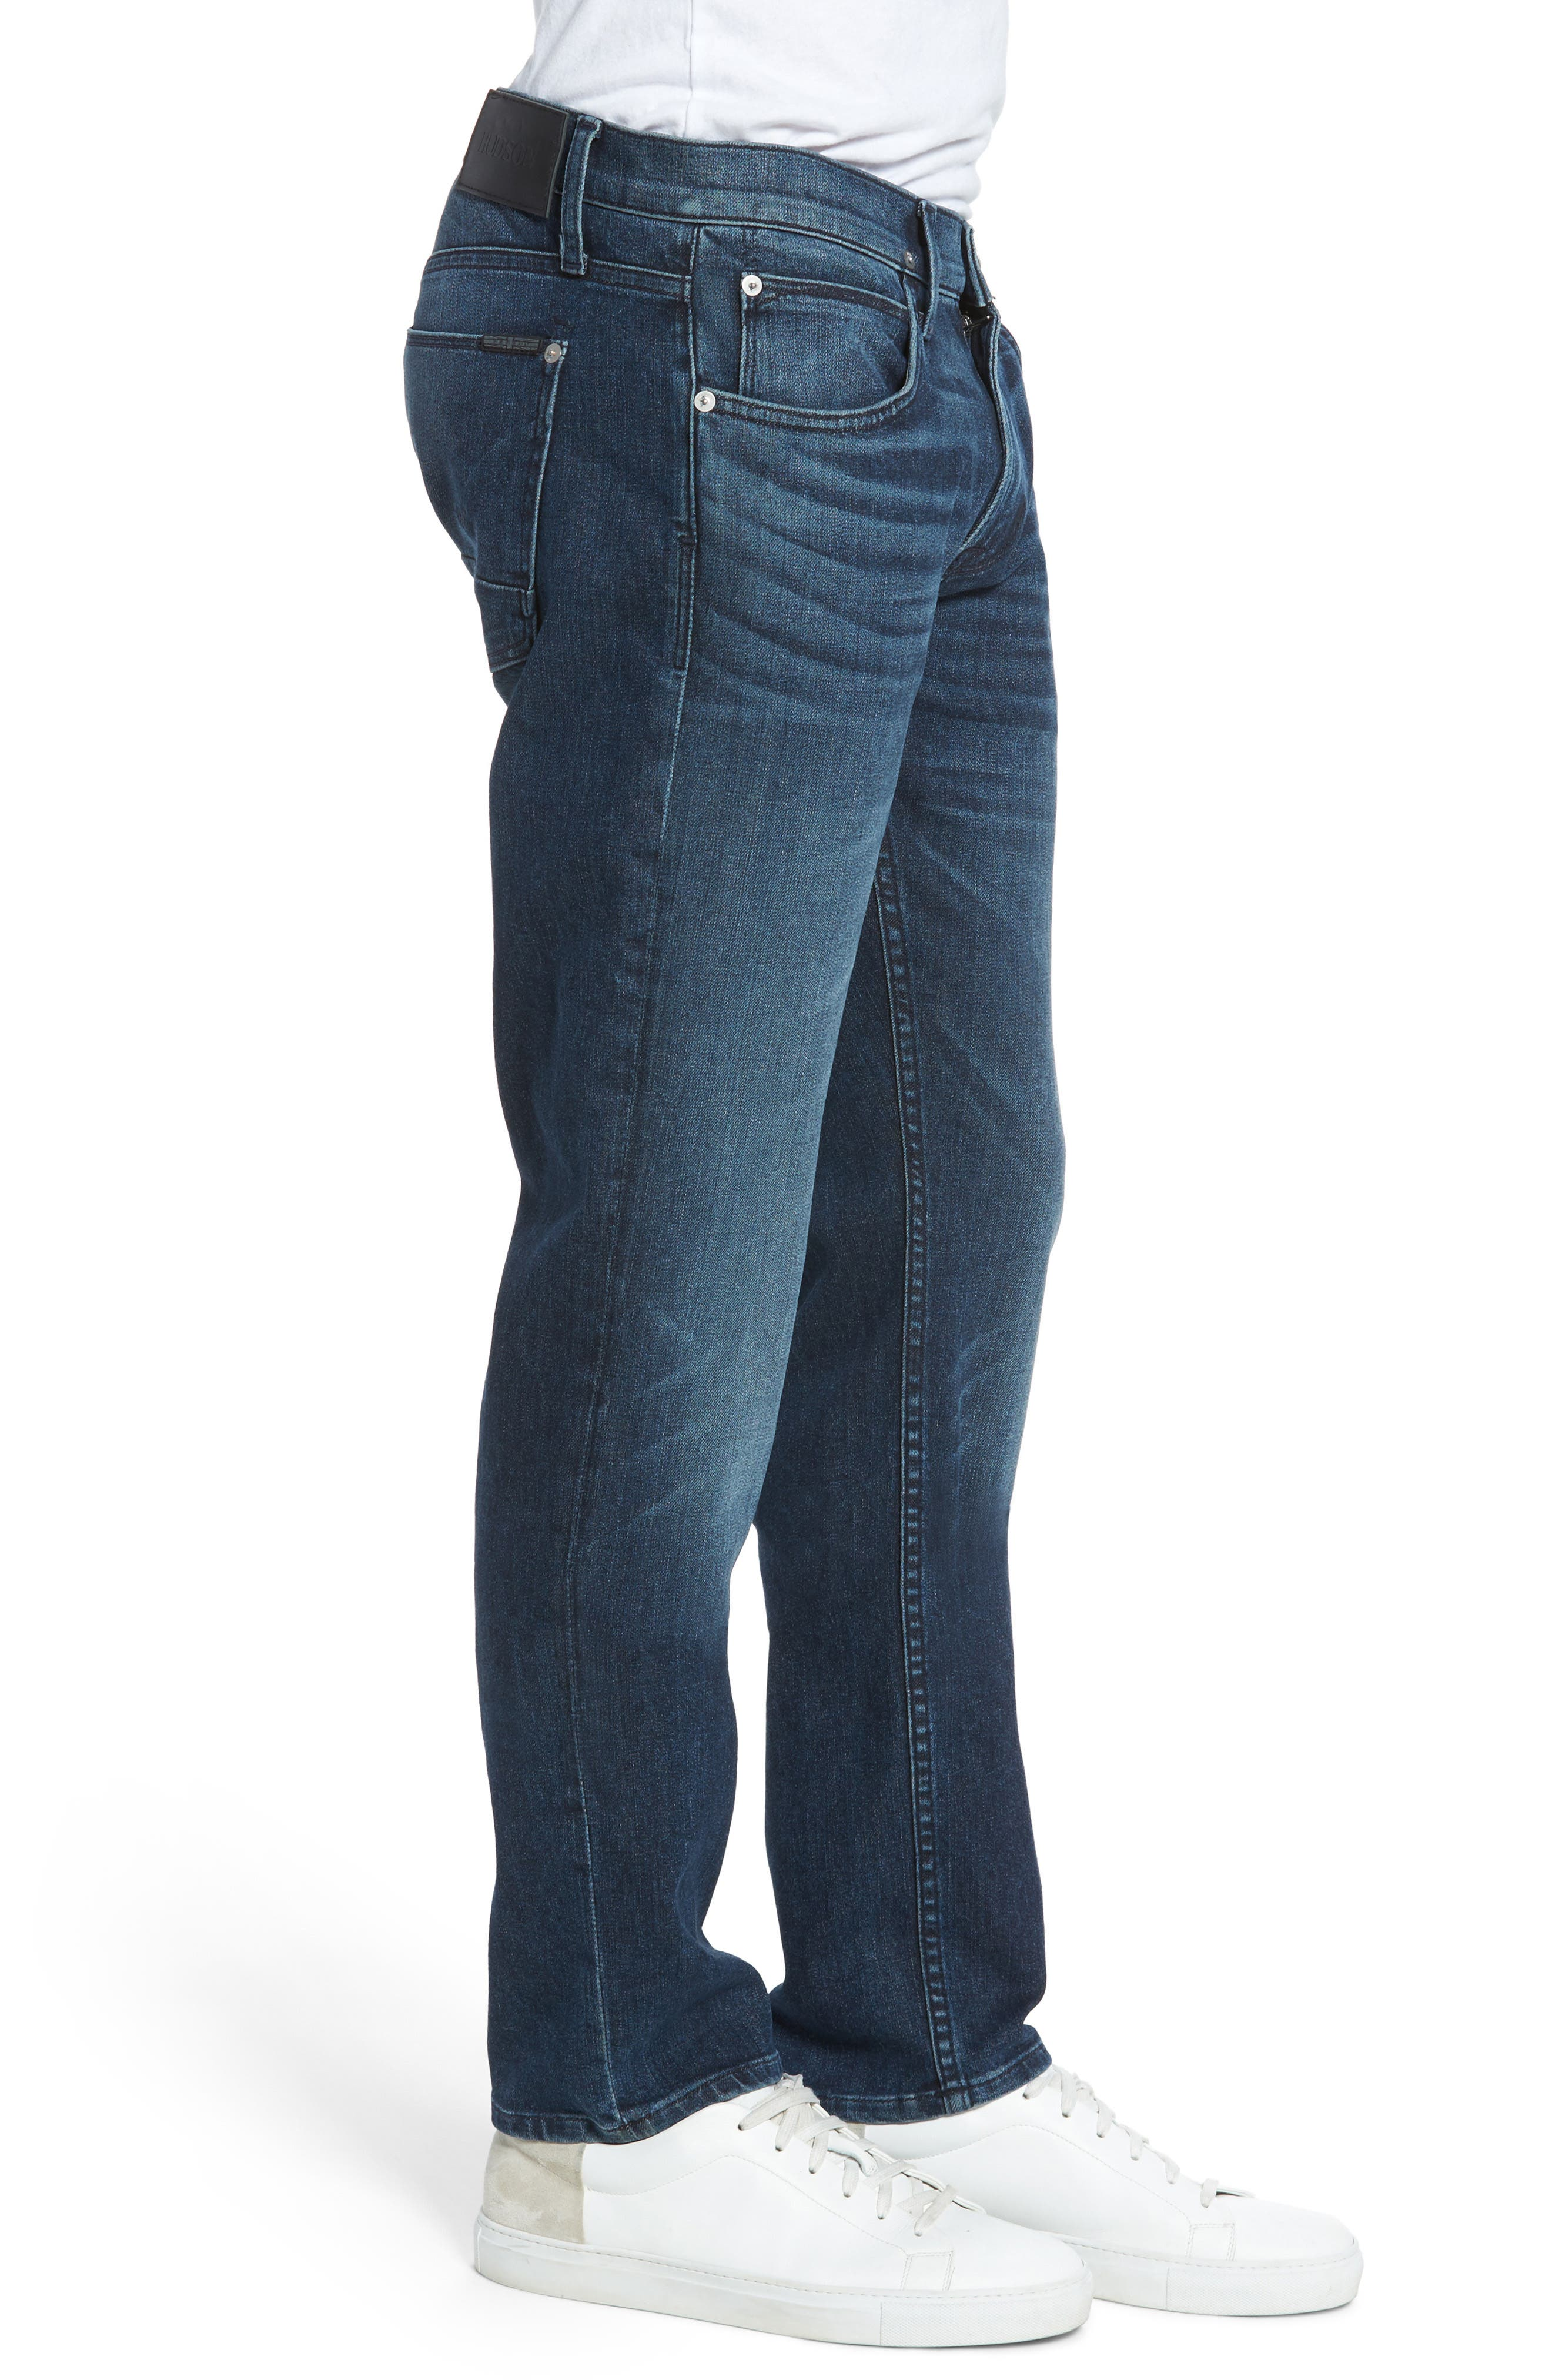 Blake Slim Fit Jeans,                             Alternate thumbnail 3, color,                             Regret